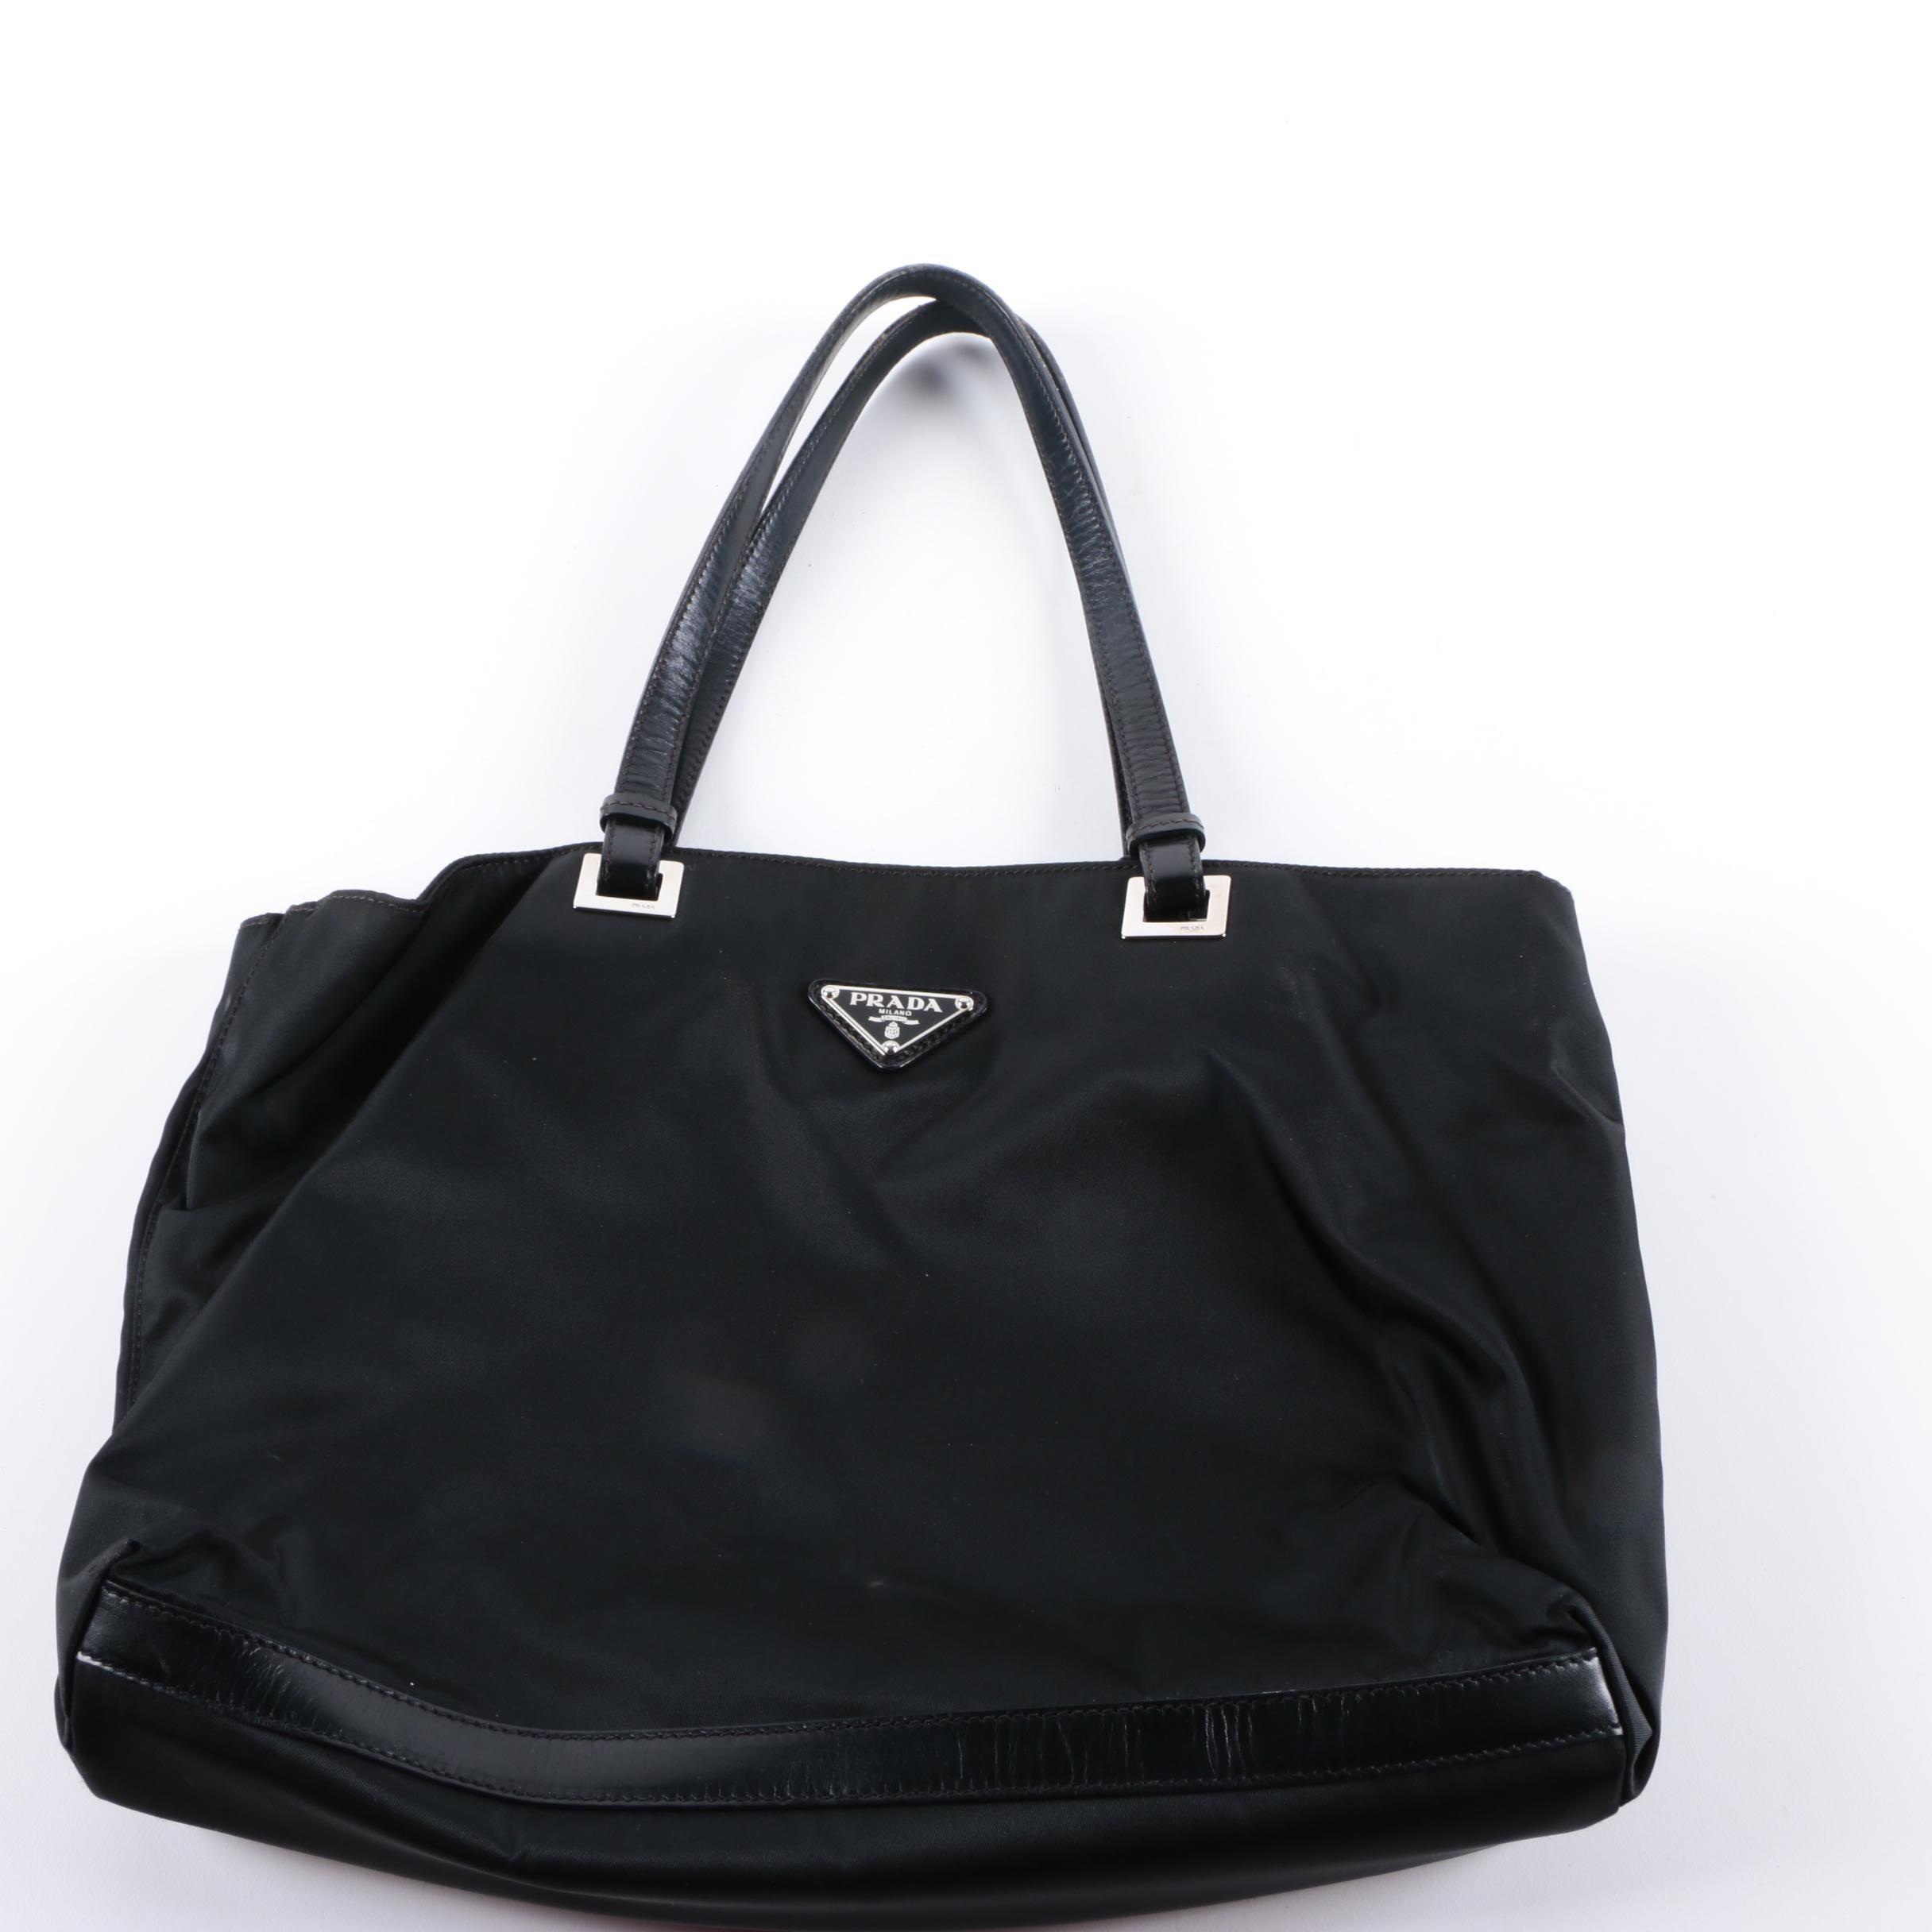 Prada Black Nylon and Leather Tote Bag